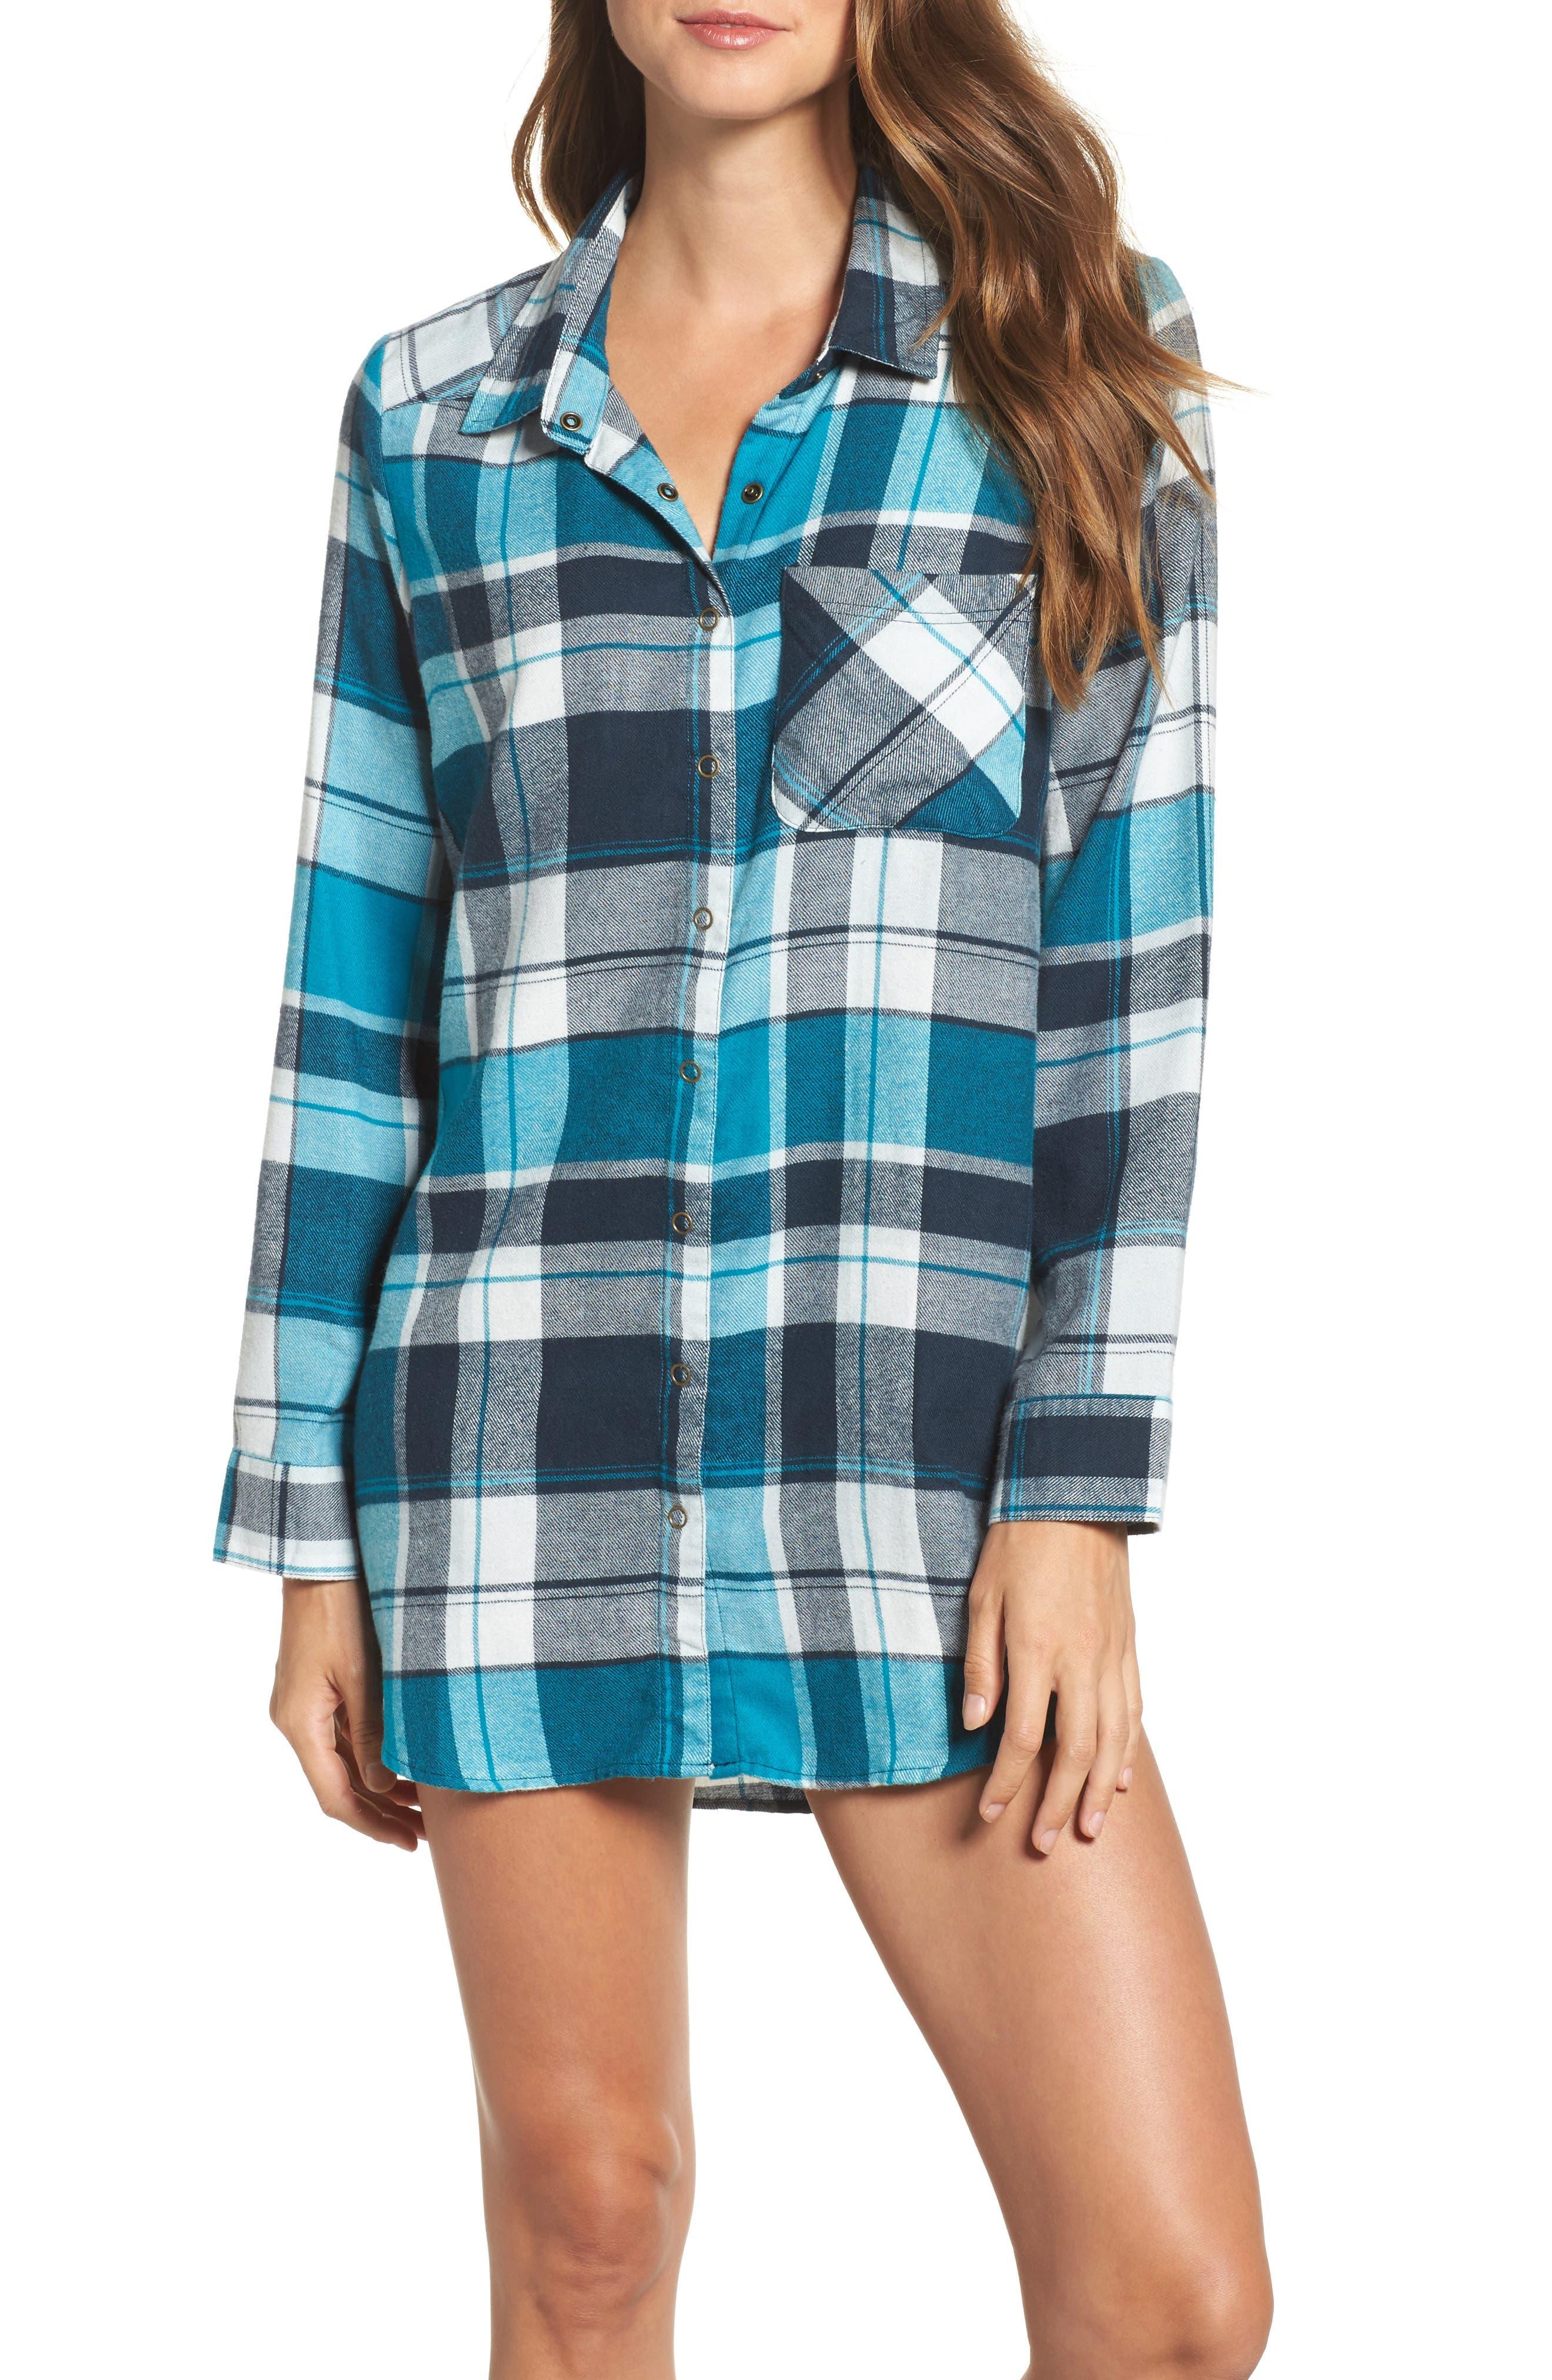 Flannel Nightshirt,                         Main,                         color, Teal Enamel Multi Plaid